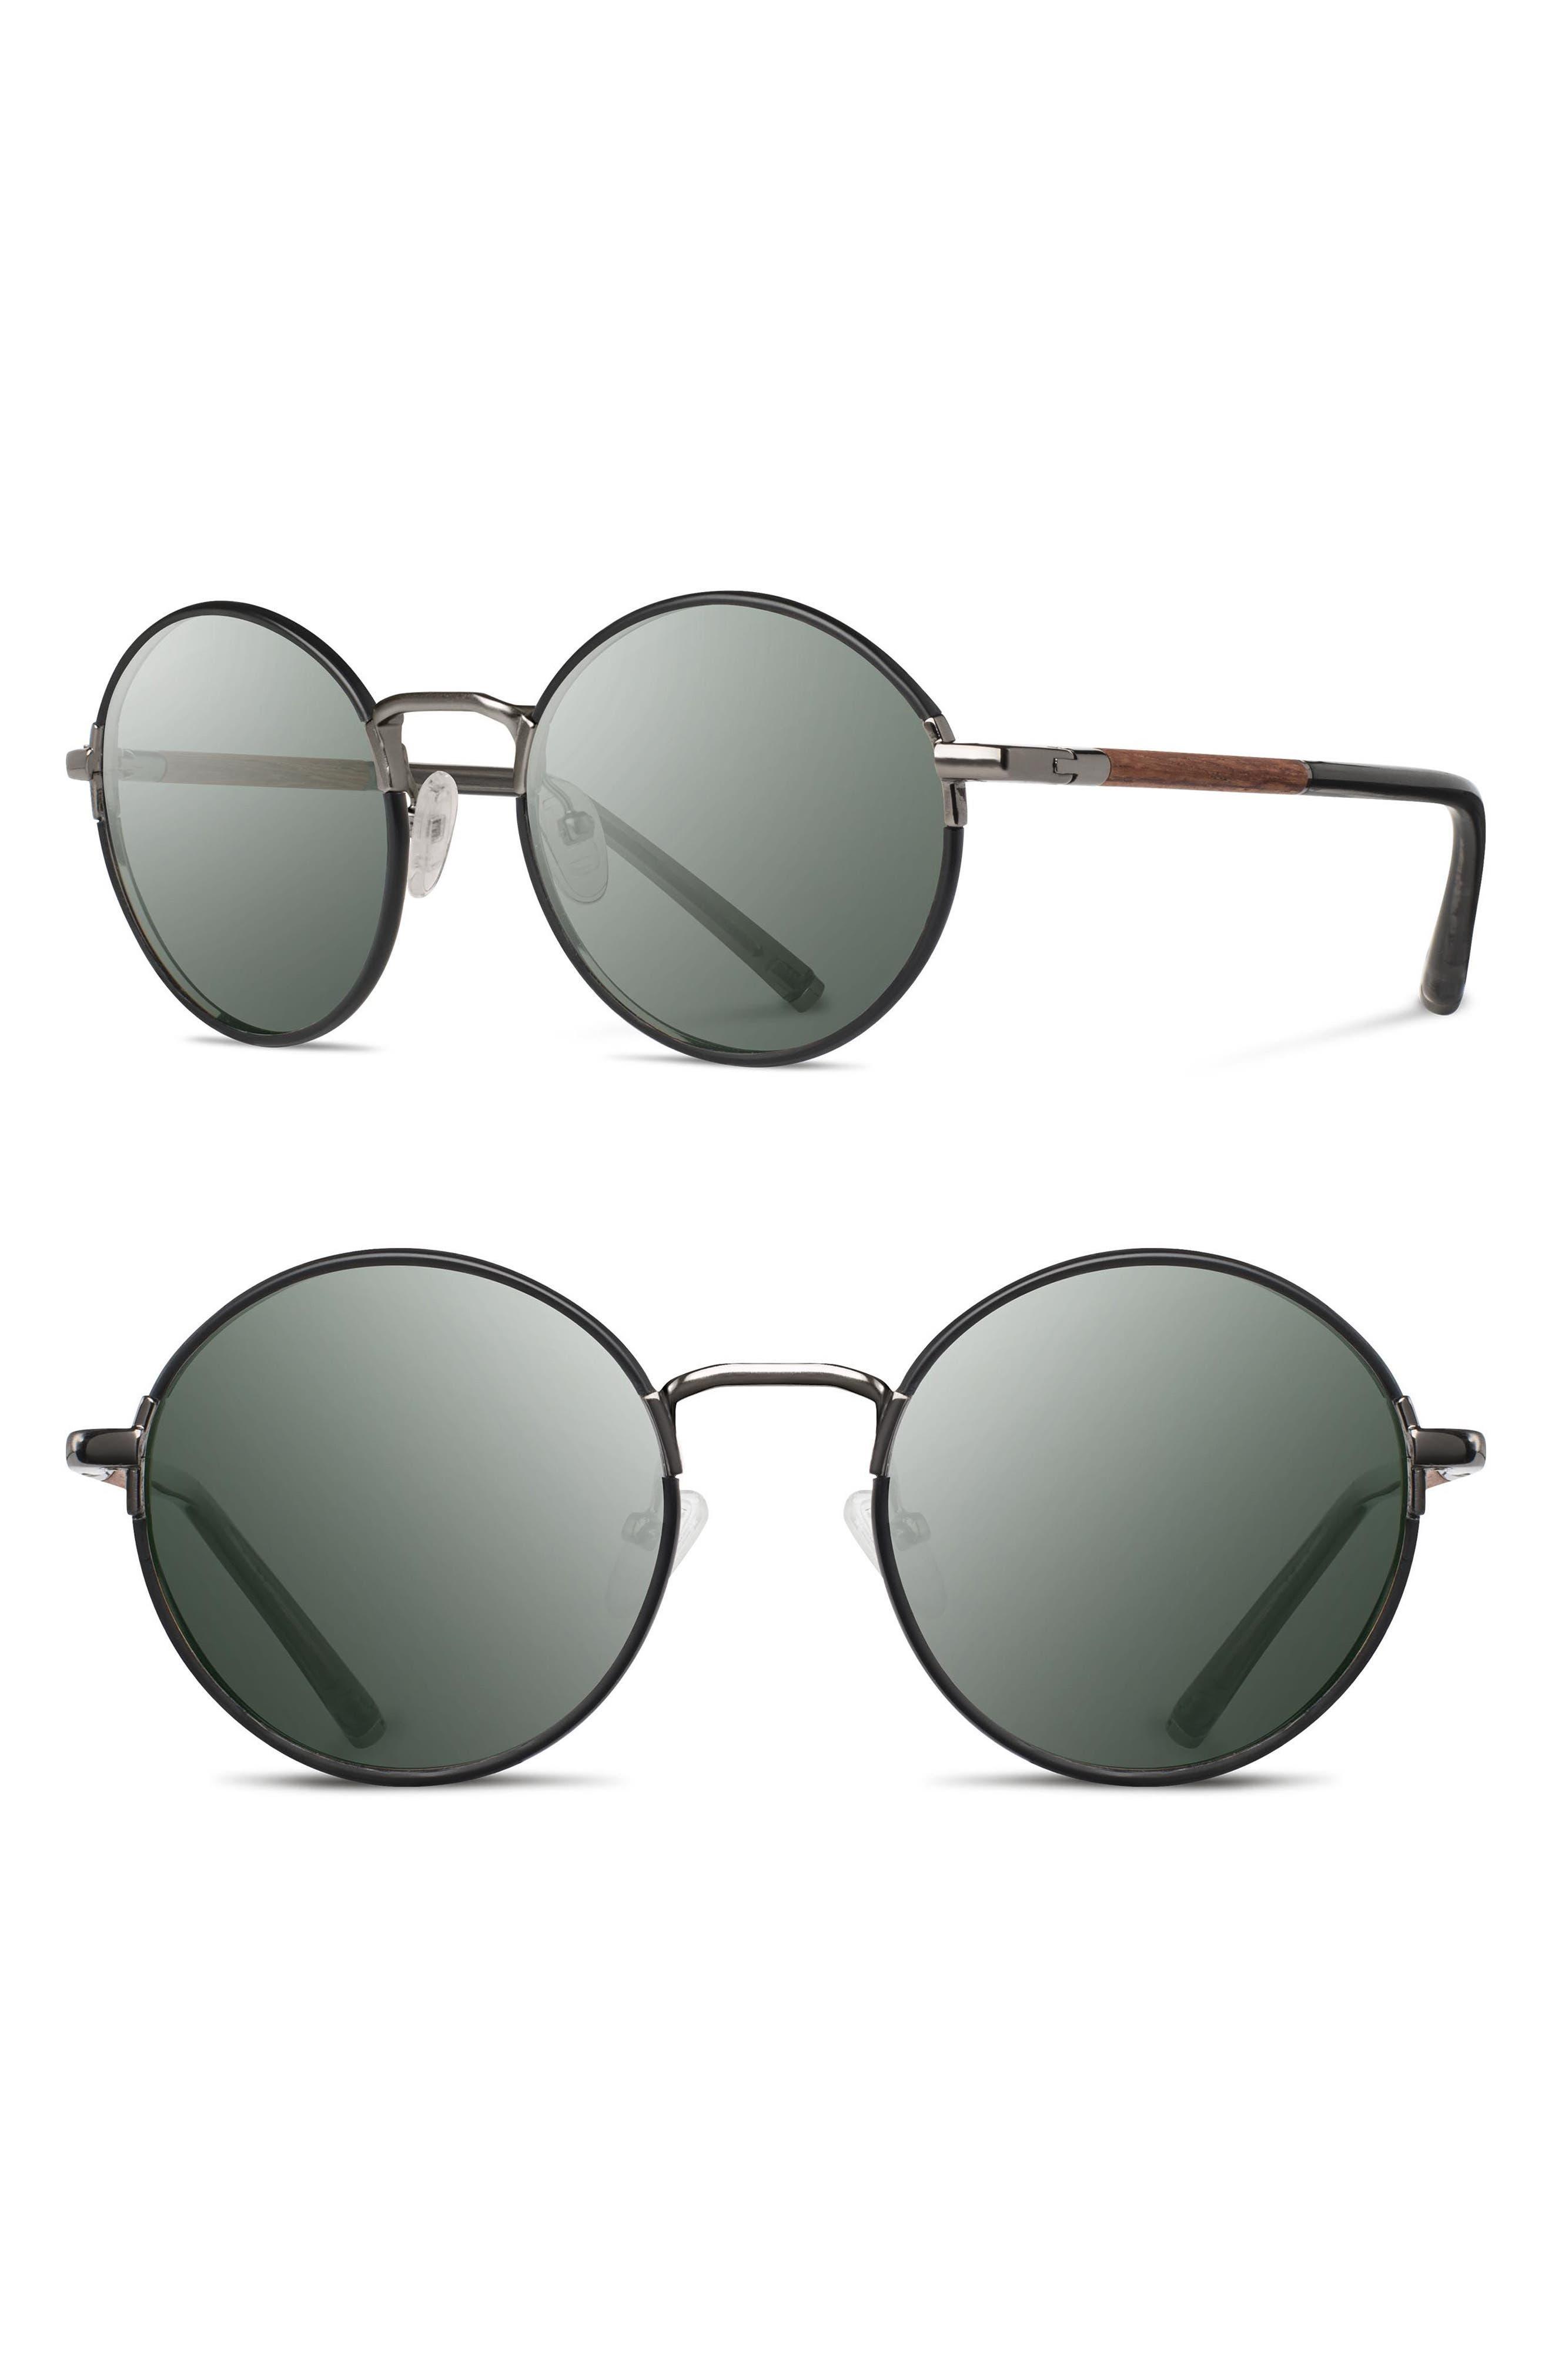 Hawthorne 50mm Acetate Sunglasses,                         Main,                         color,